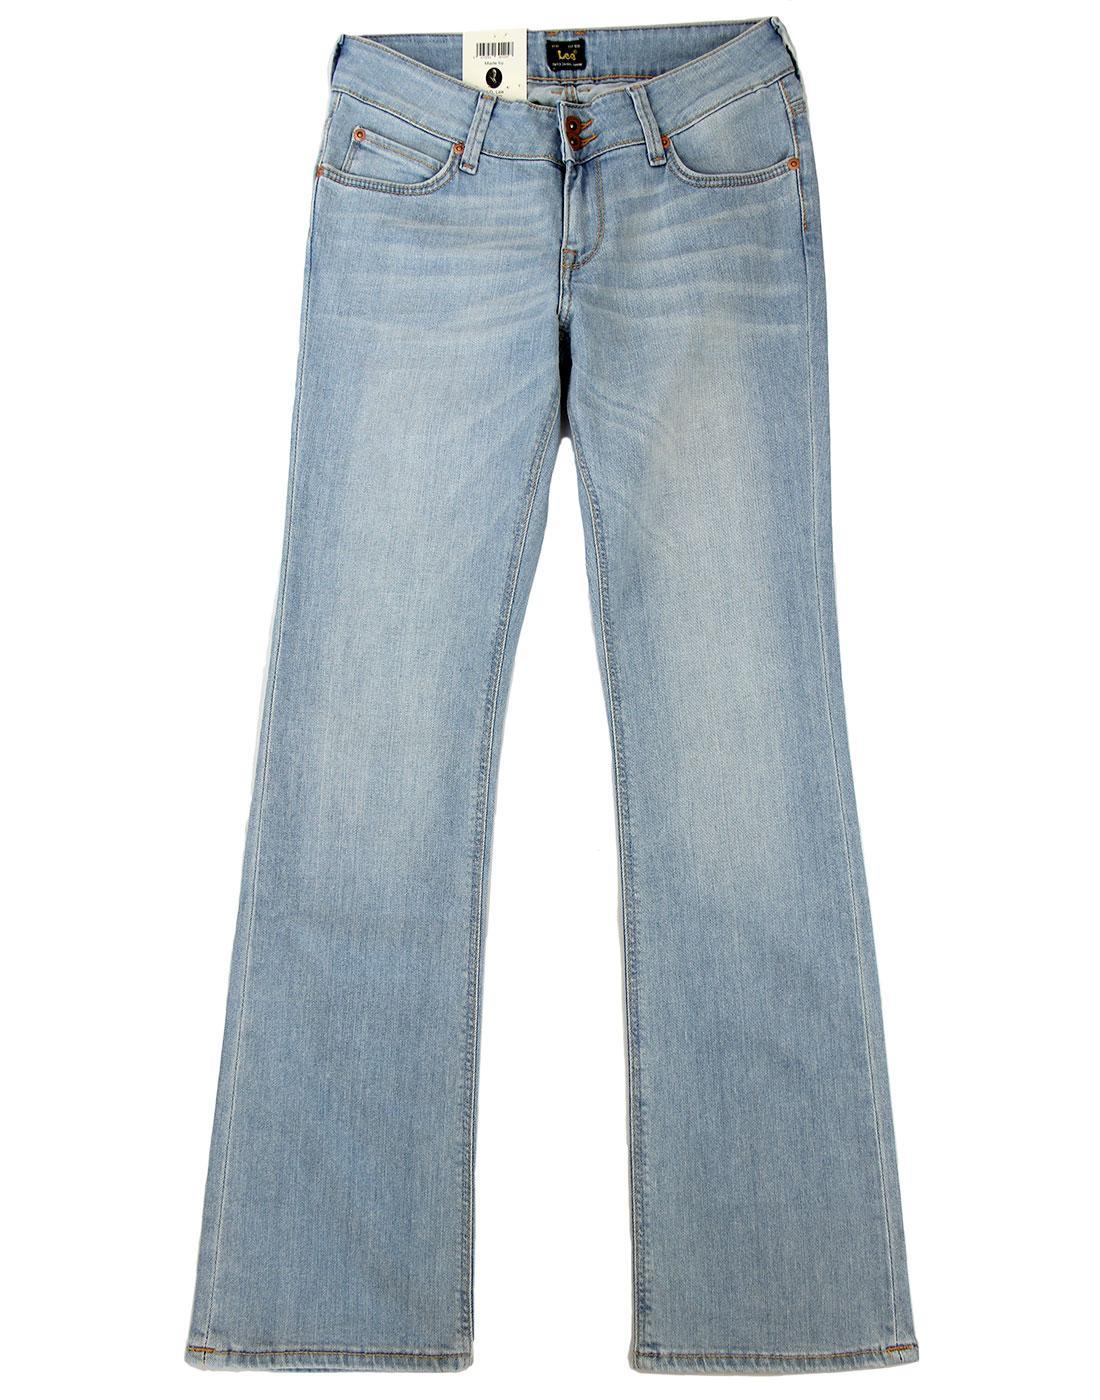 Joliet LEE JEANS Retro Skinny Denim Jeans